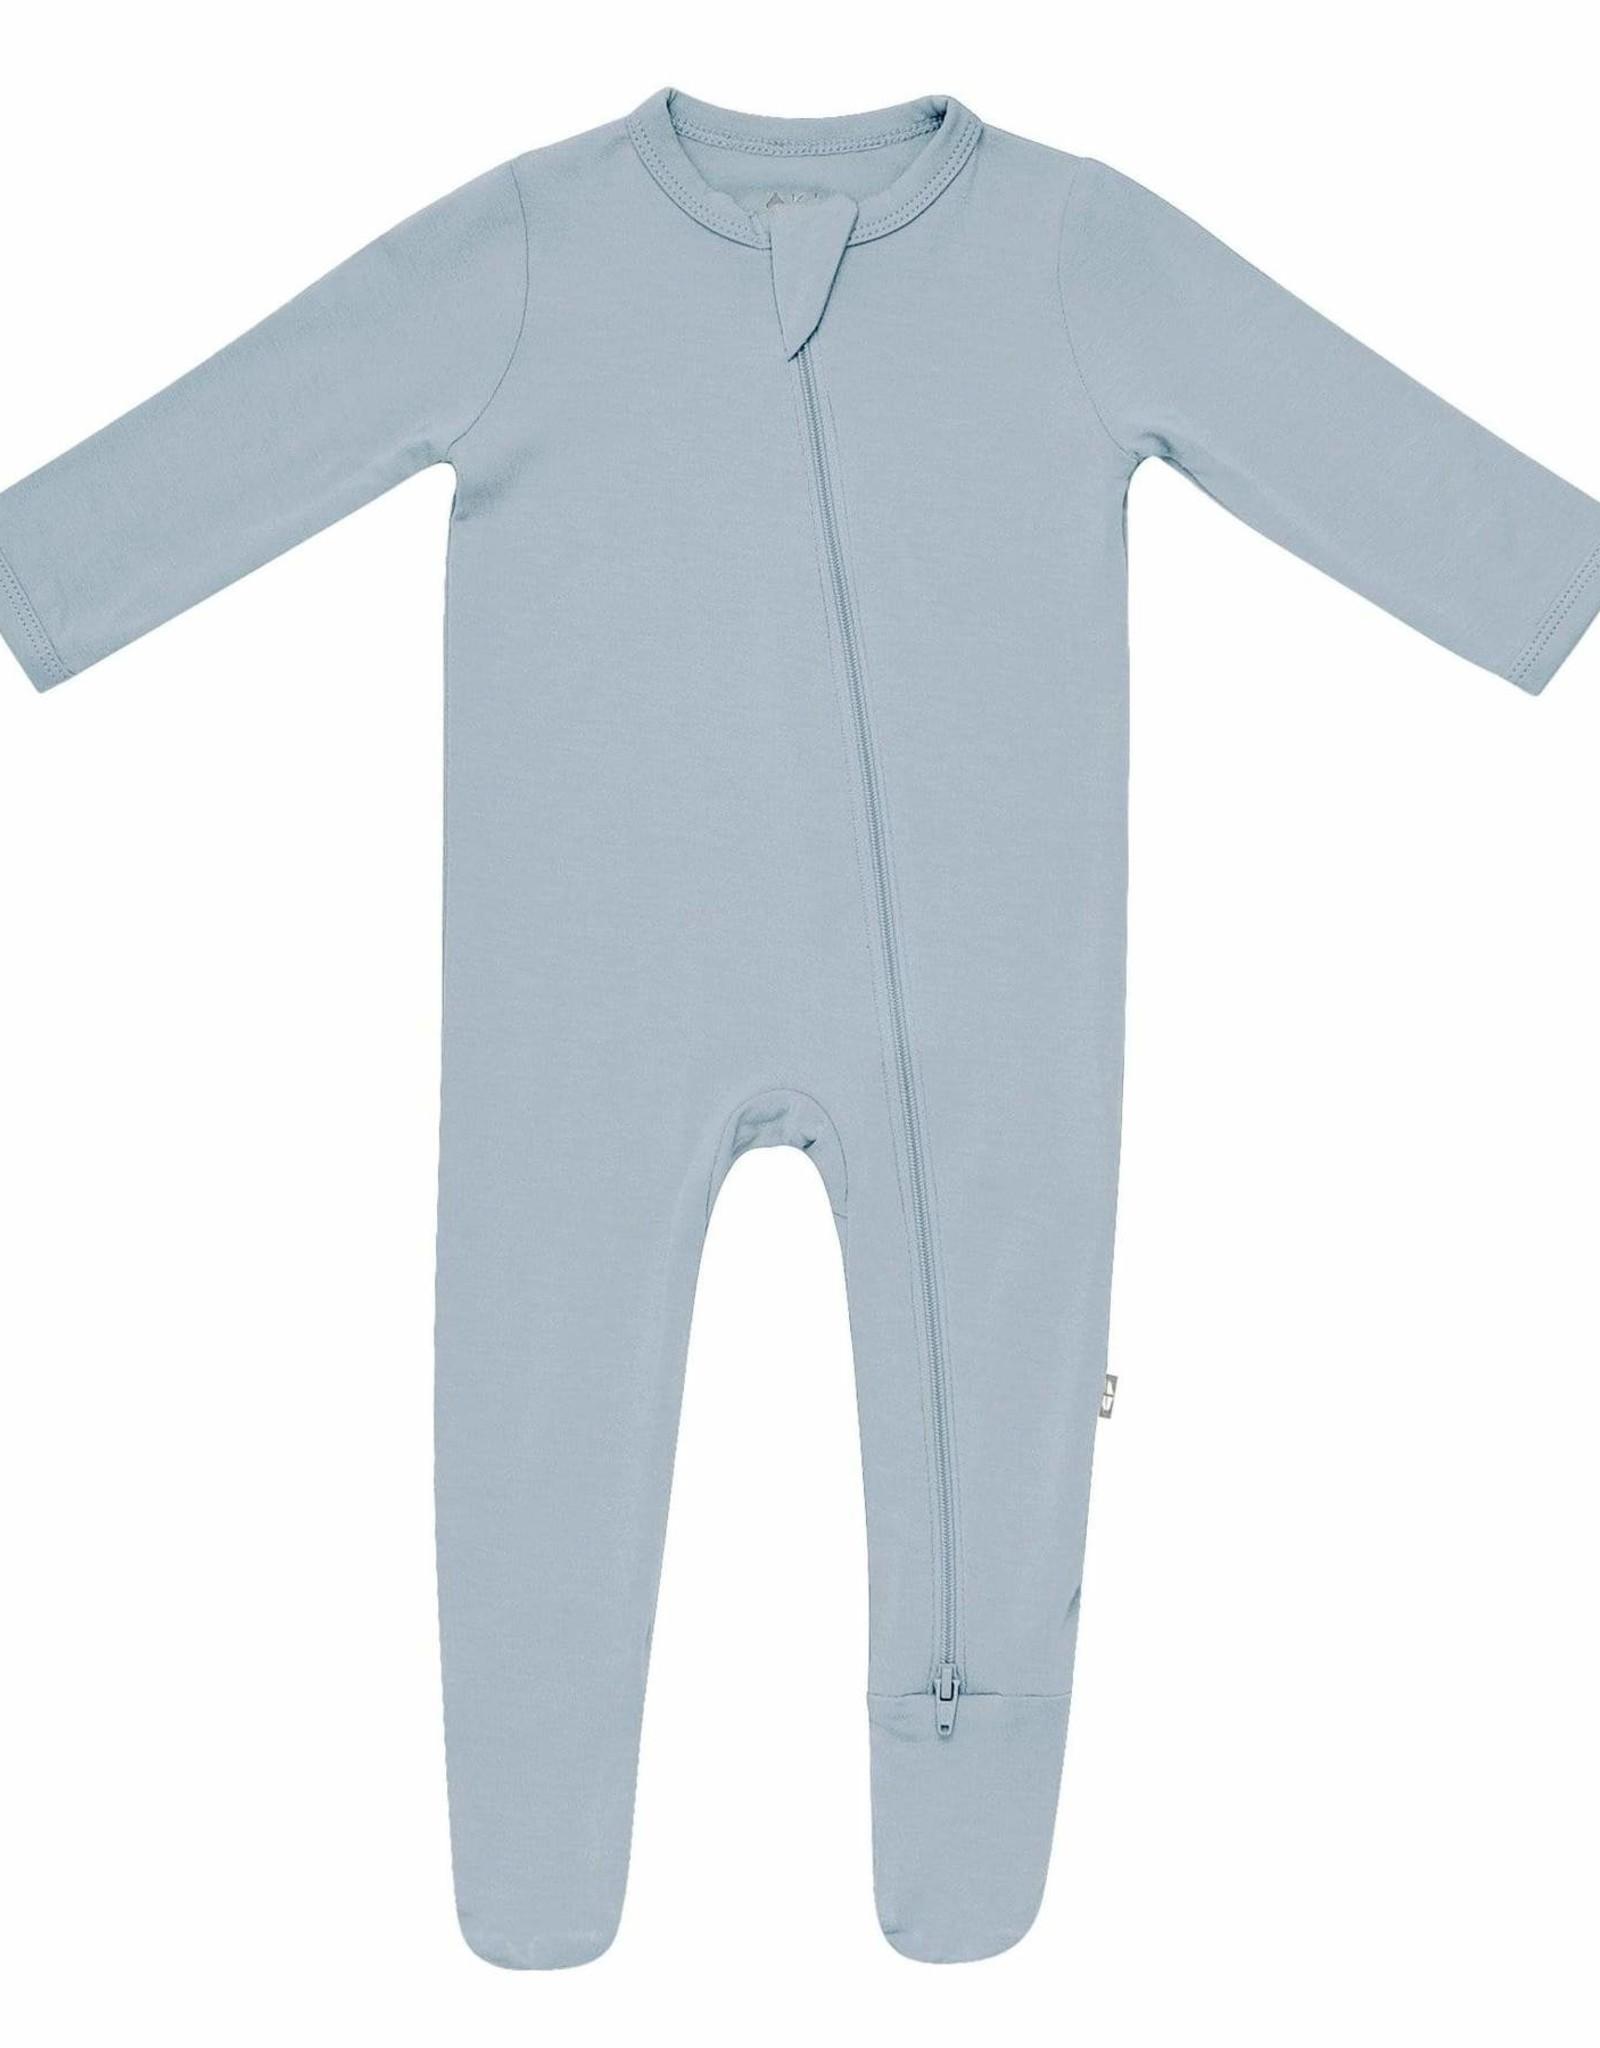 Kyte Baby zippered footie- fog